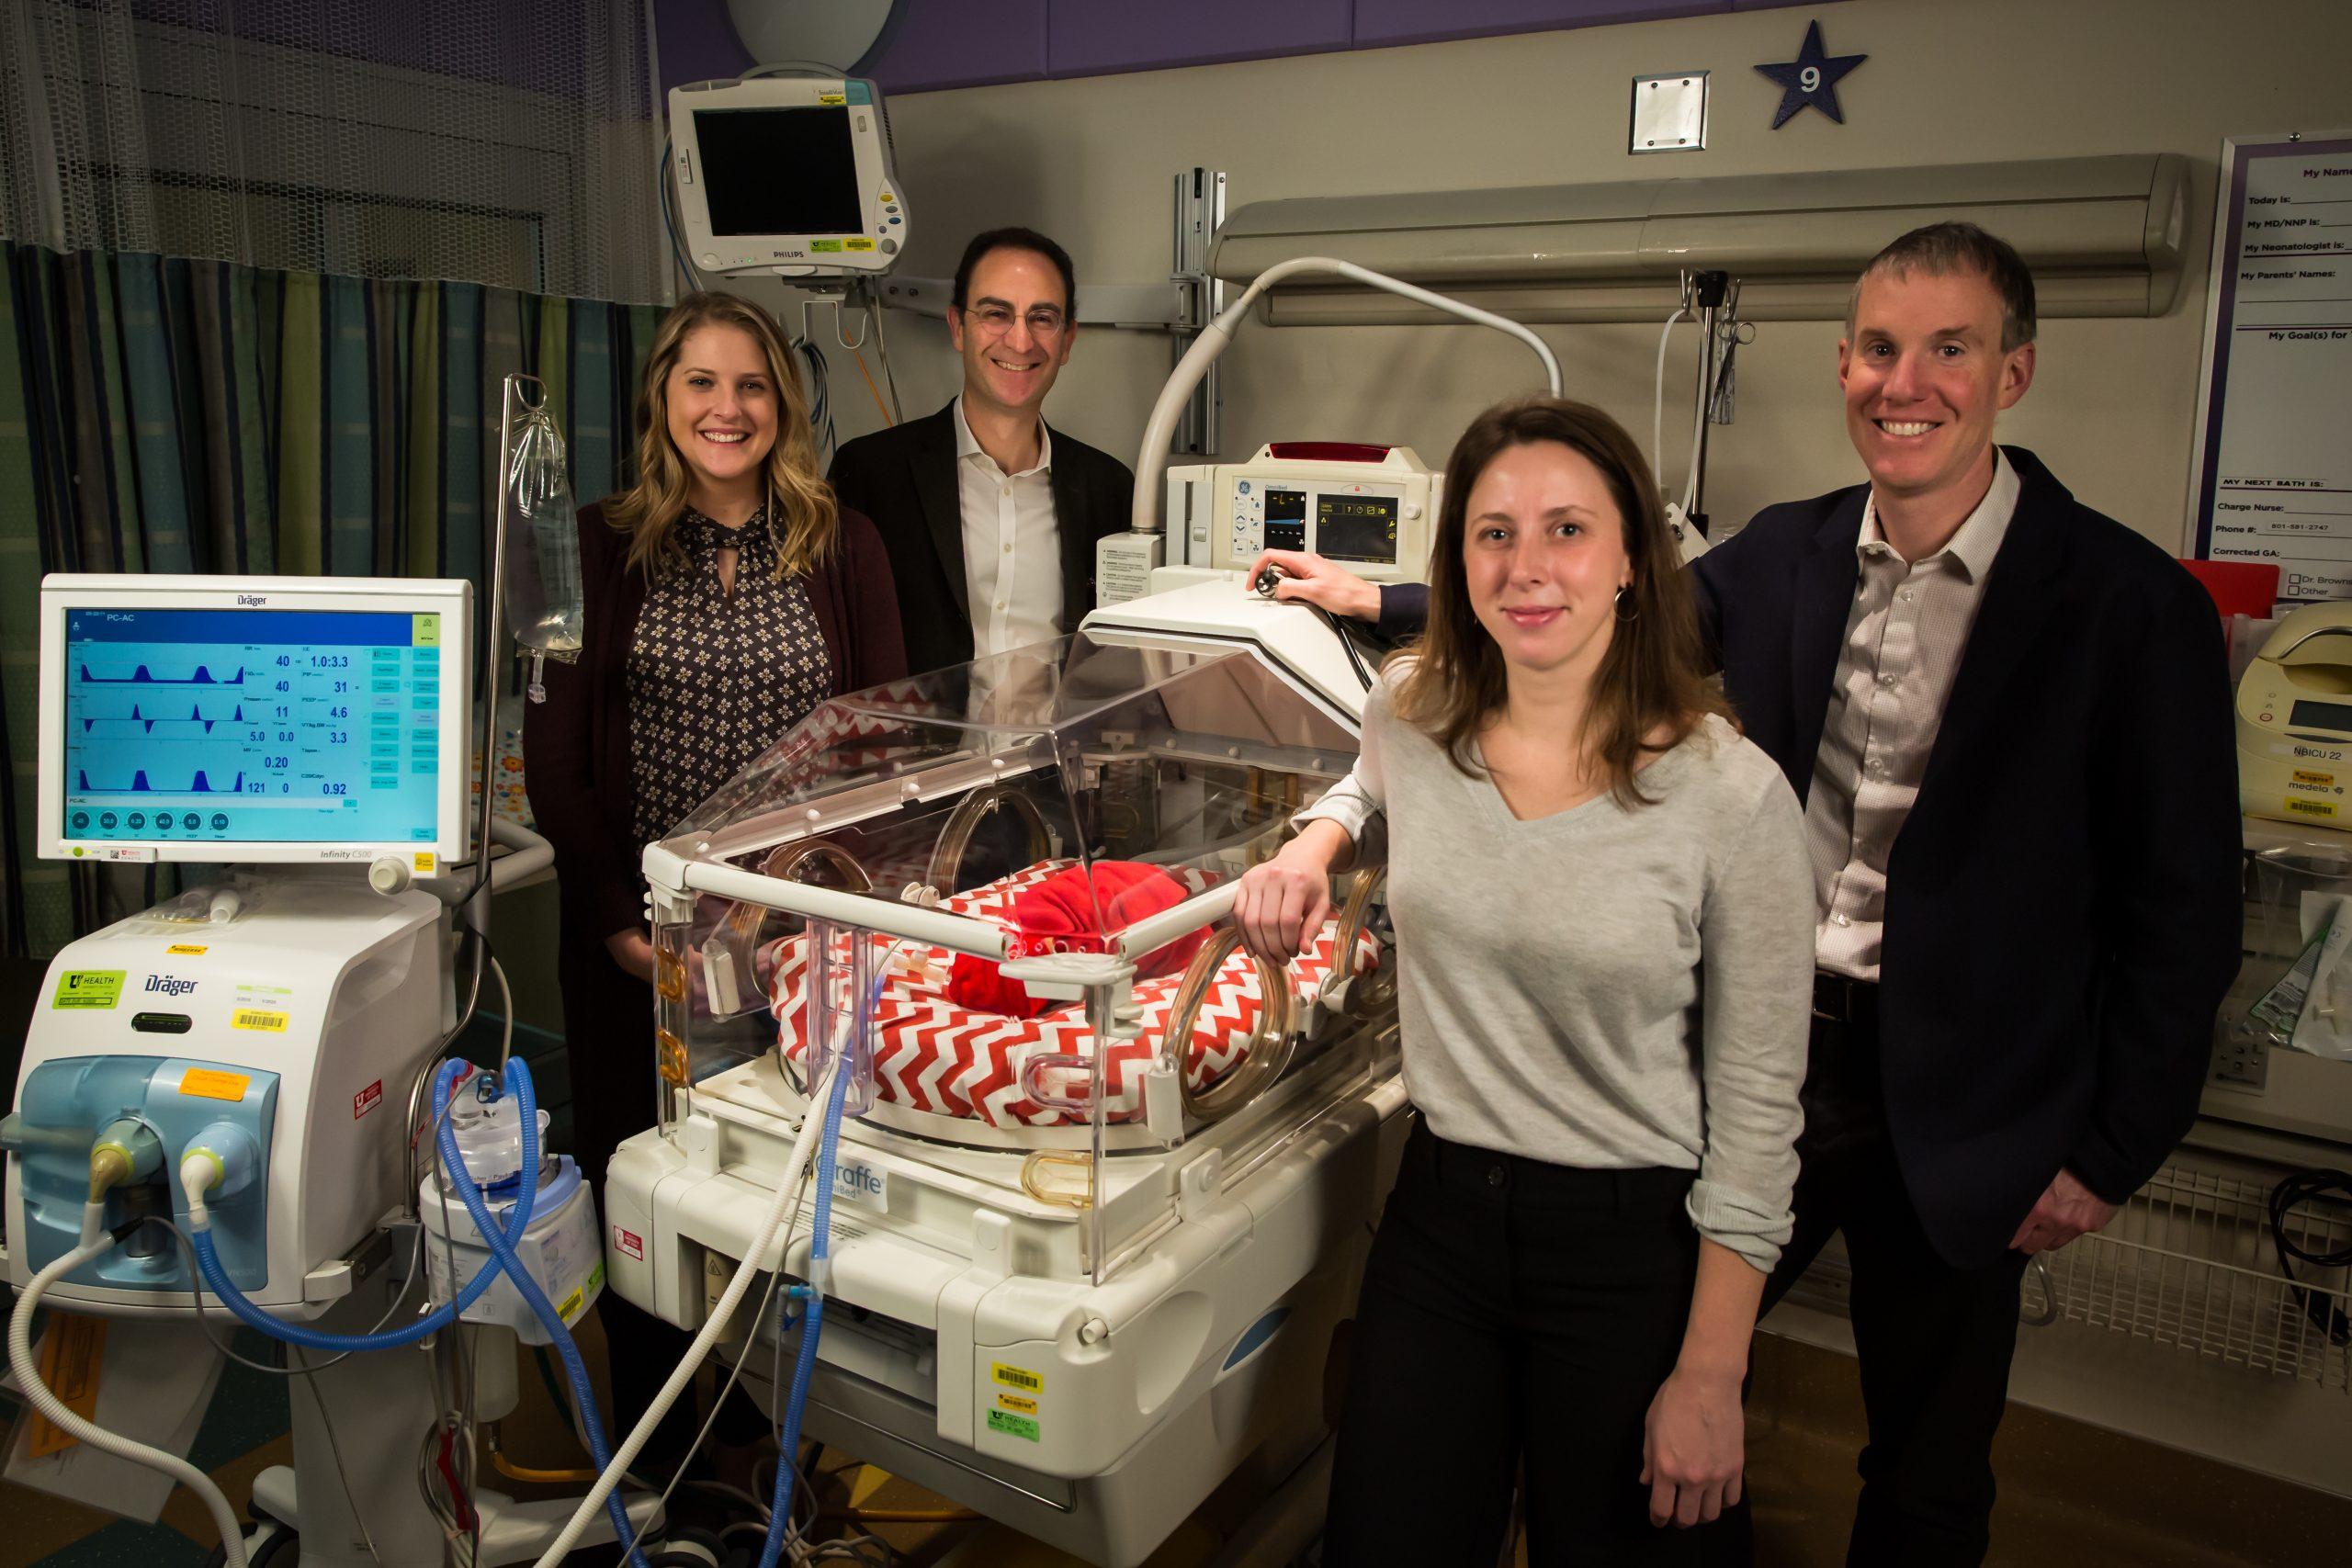 Sabrina Malone Jenkins, MD, Luca Brunelli, MD, Rachel Palmquist, CGC, Joshua Bonkowsky, MD, University of Utah Health.